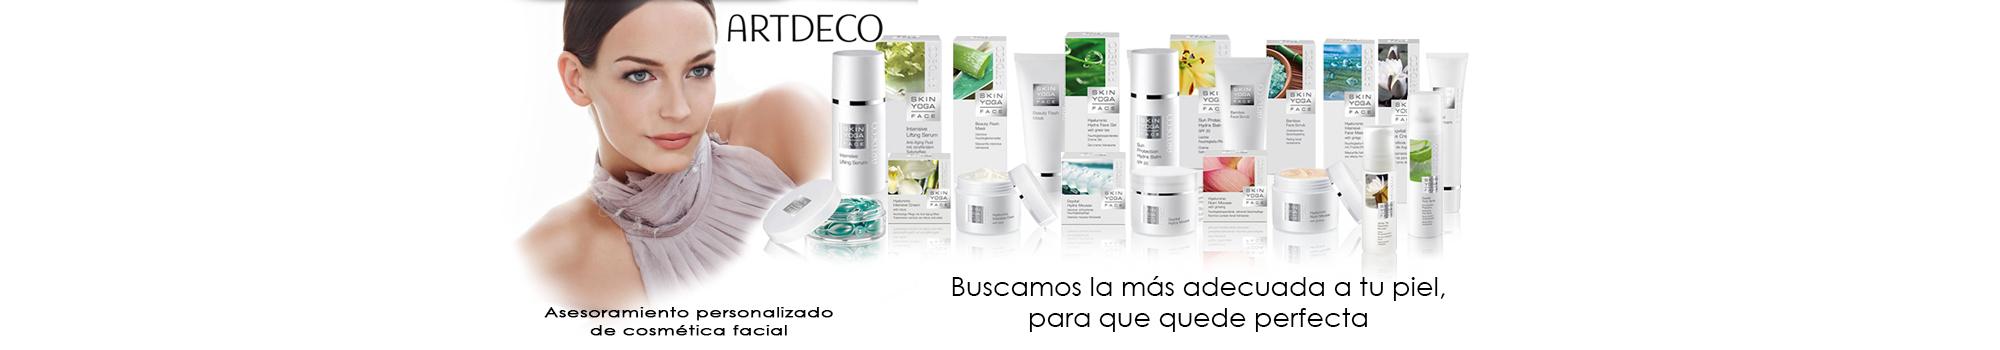 Estética y belleza Tamara en Vega Baja, Esteticien en Vega Baja, Oferta depilación en Vega Baja